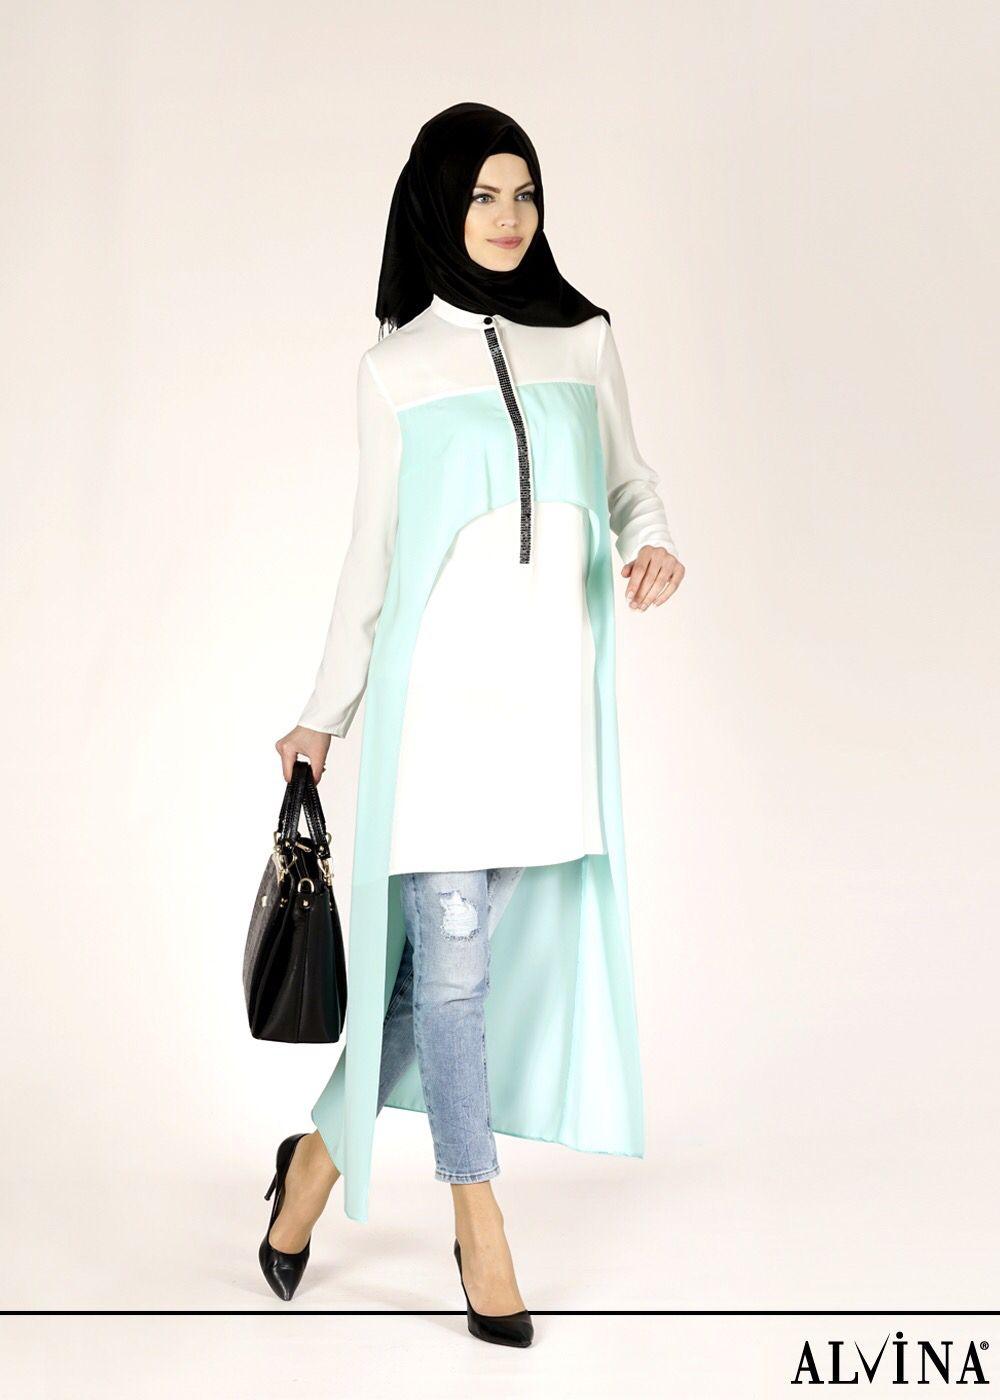 Joyagh Hijab Pinterest Modest Fashion And Hijab Fashion